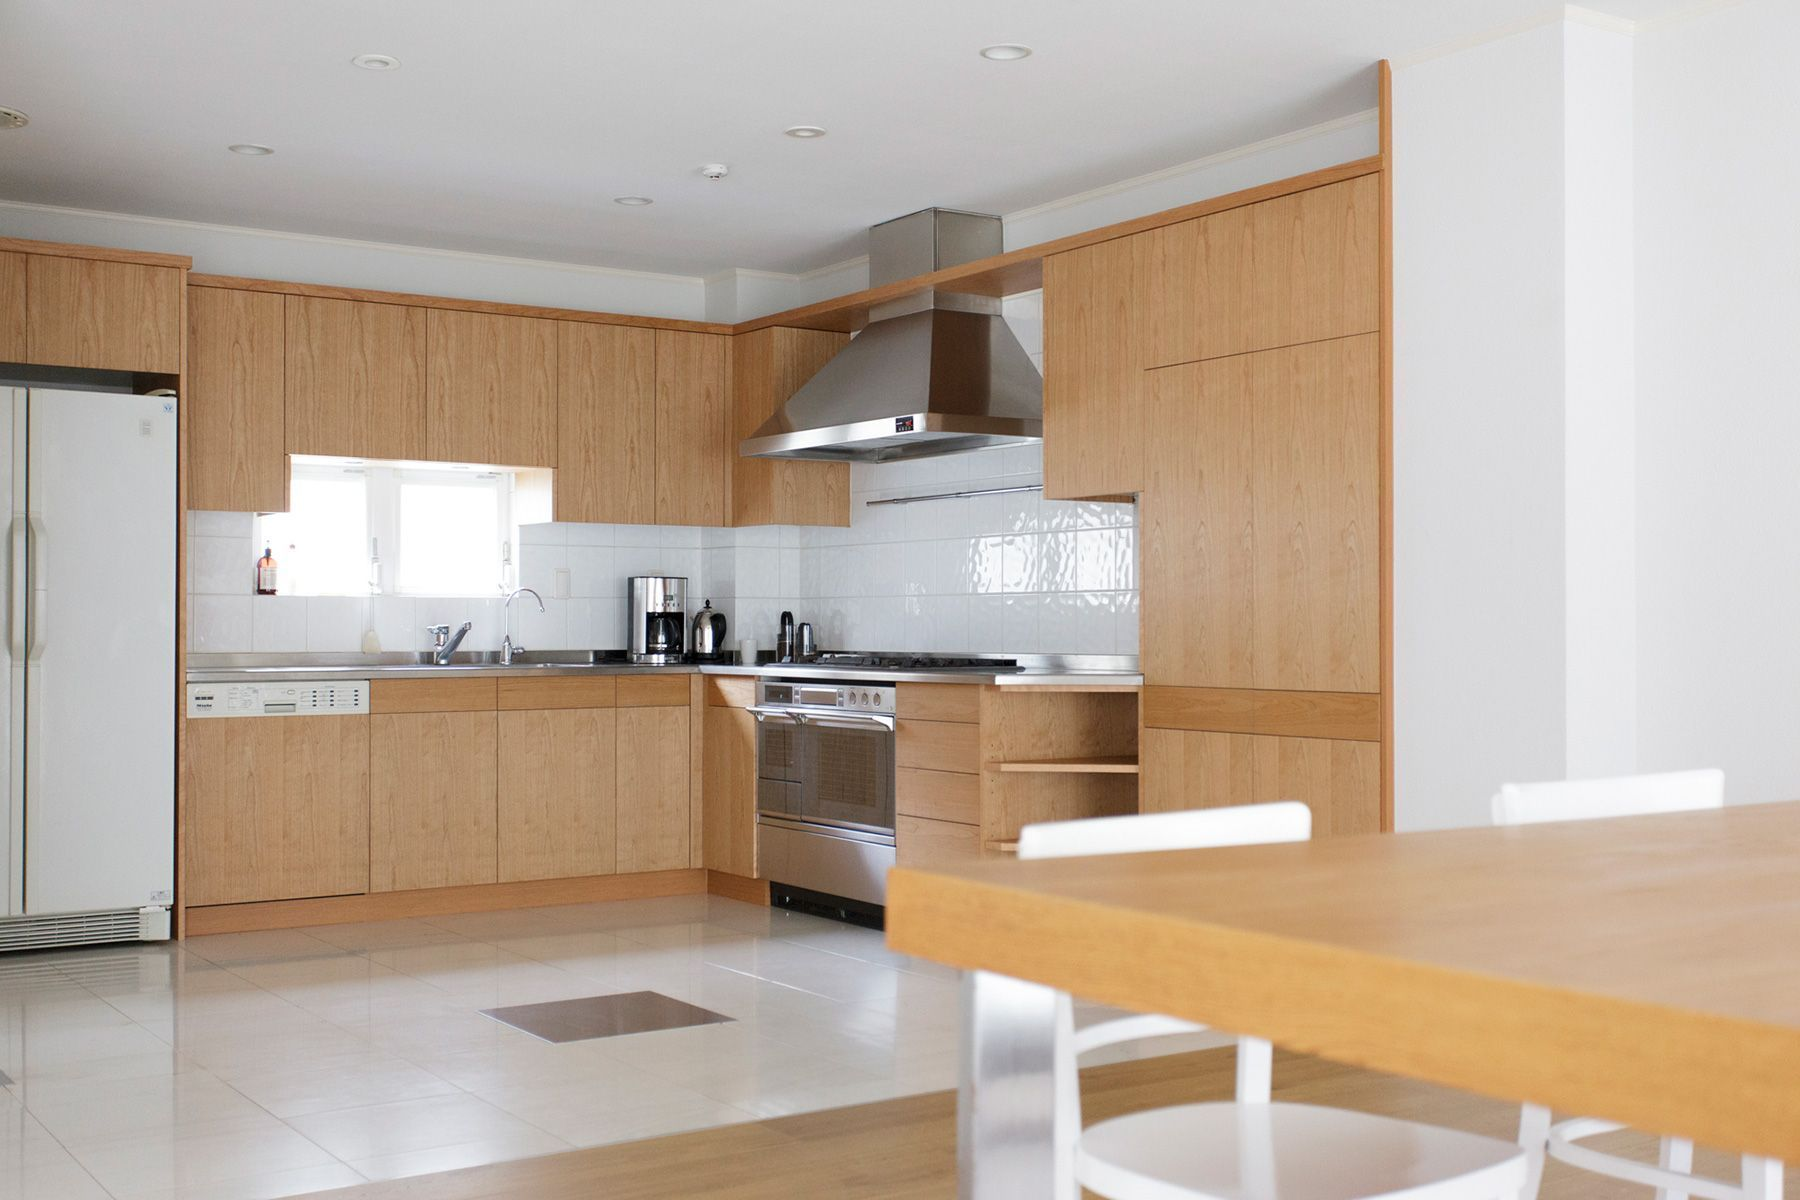 SHILO STUDIO MEGURO (シロスタジオ メグロ)1F キッチン